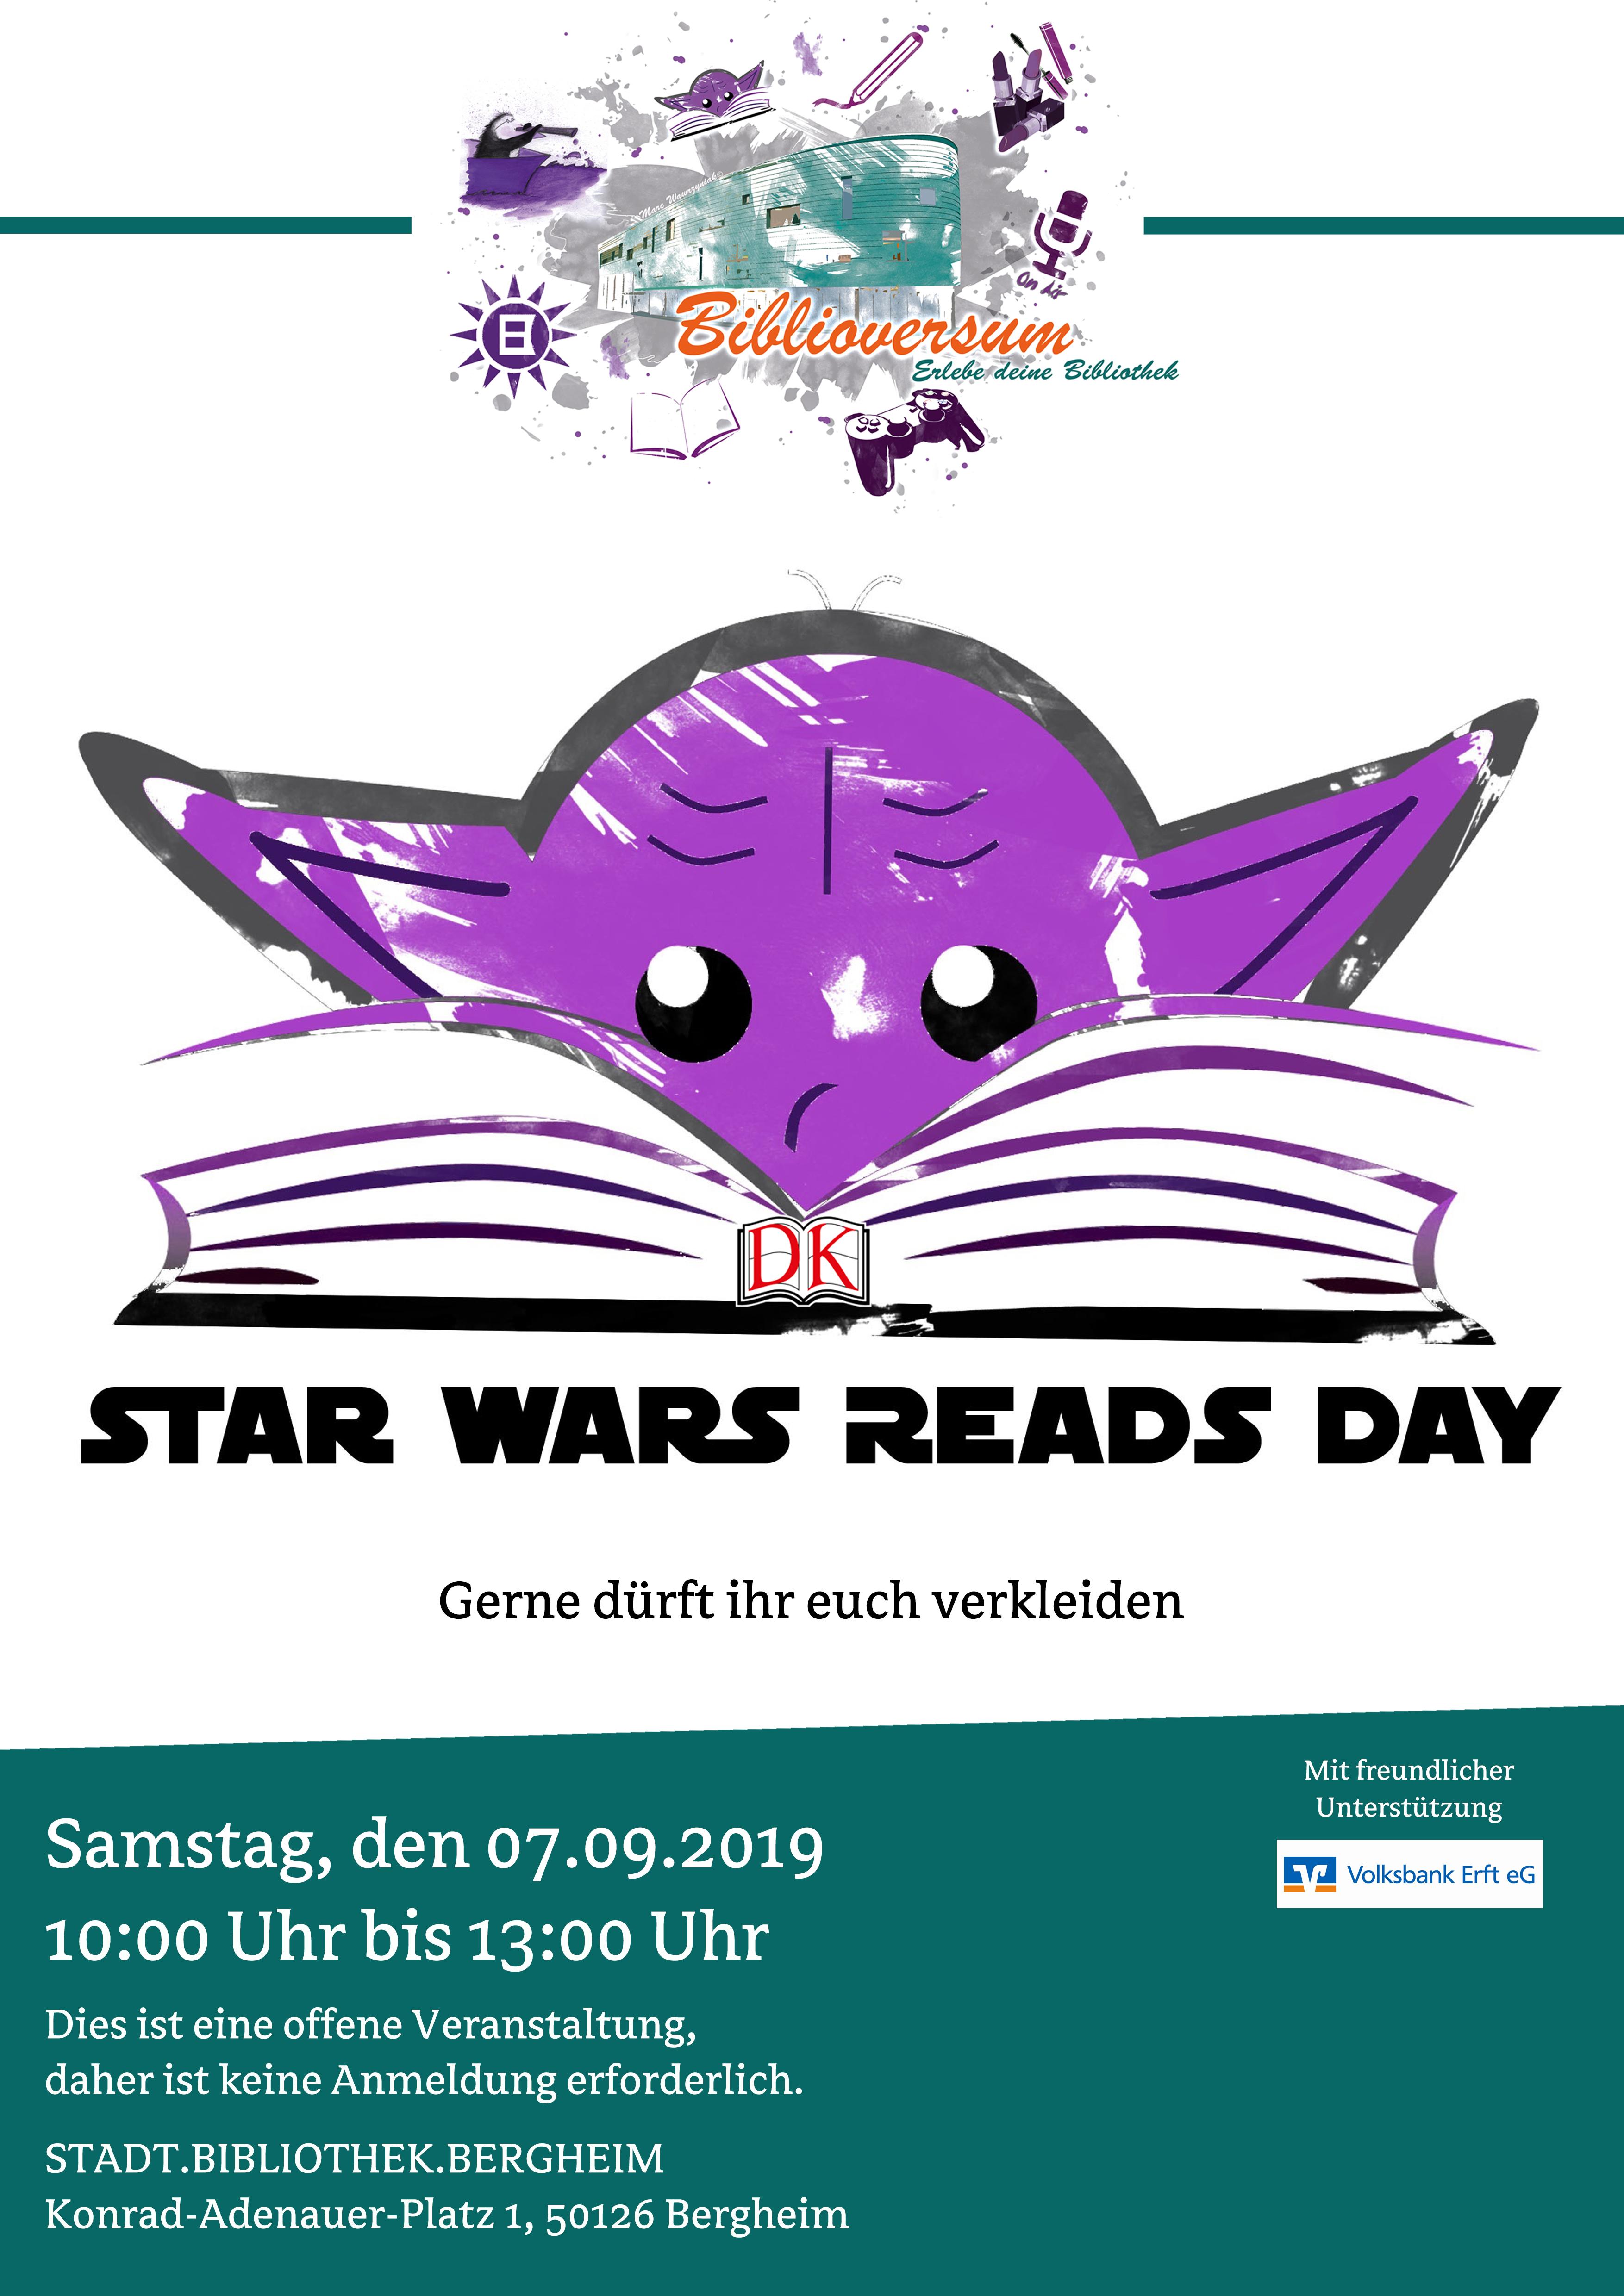 Stadtbibliothek Bergheim > Biblioversum > Veranstaltungen host ...